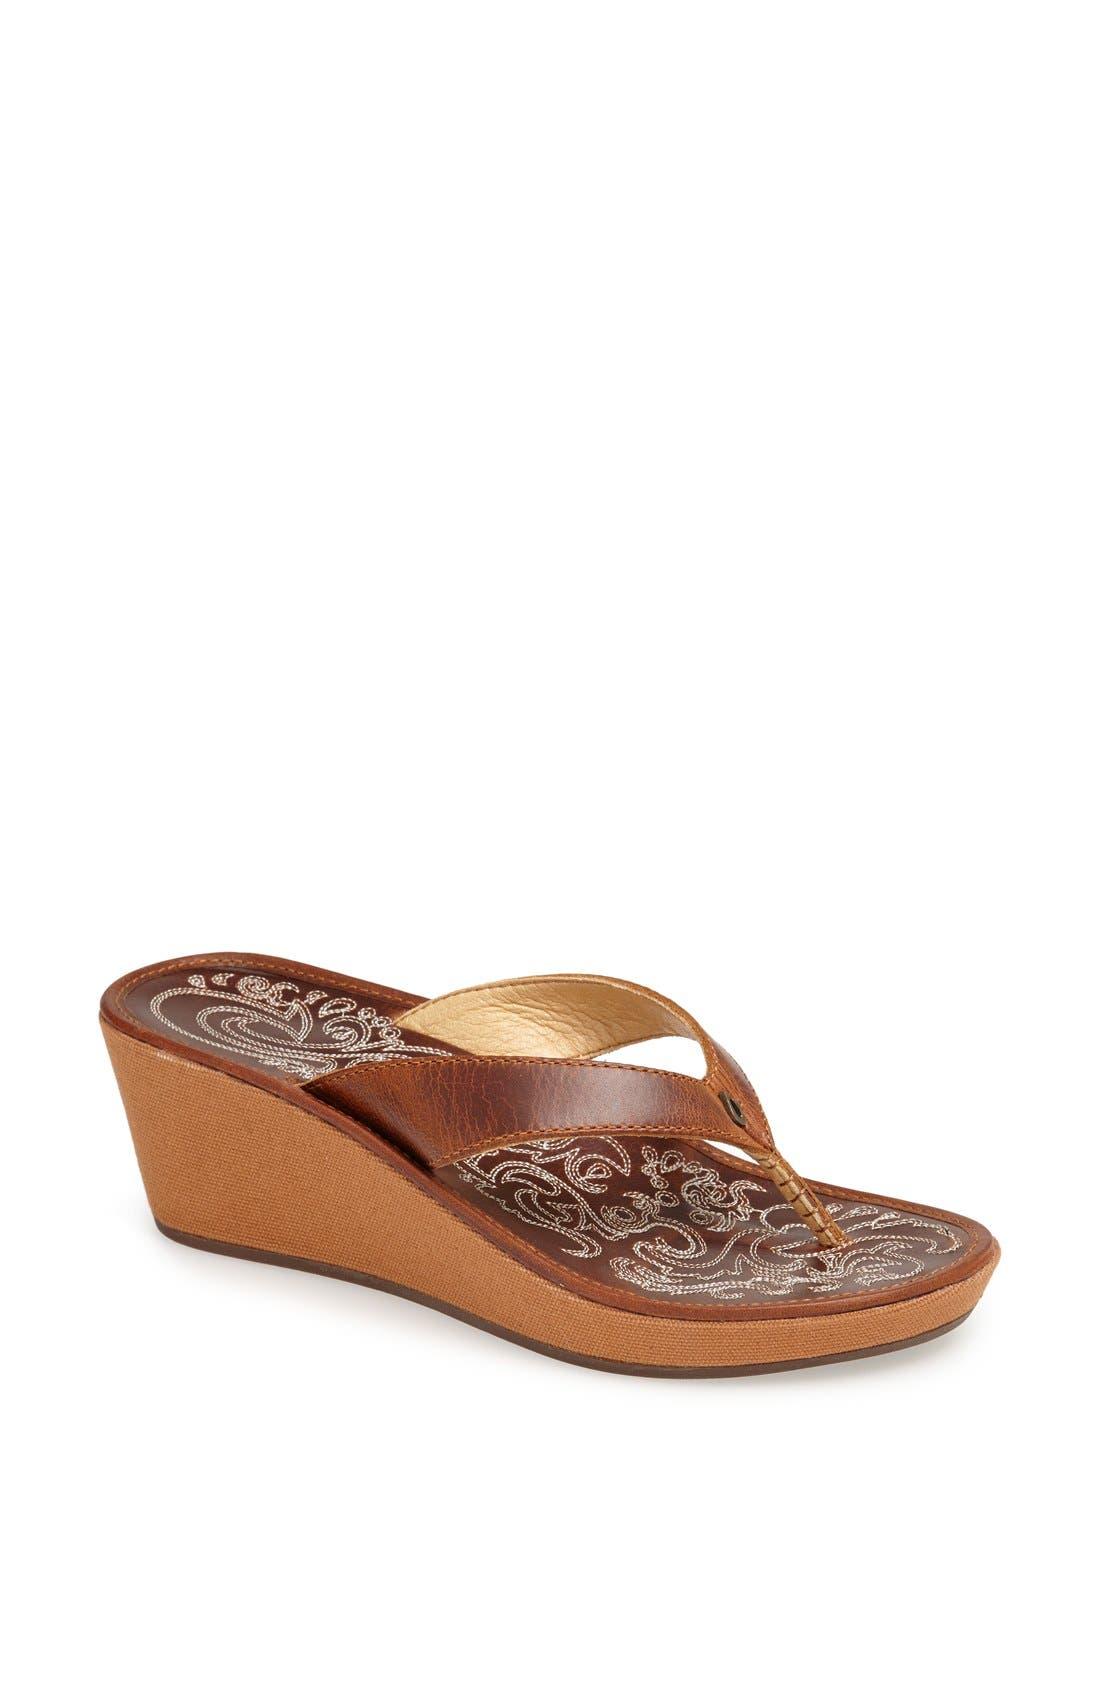 Main Image - OluKai 'Kaula Lio' Sandal